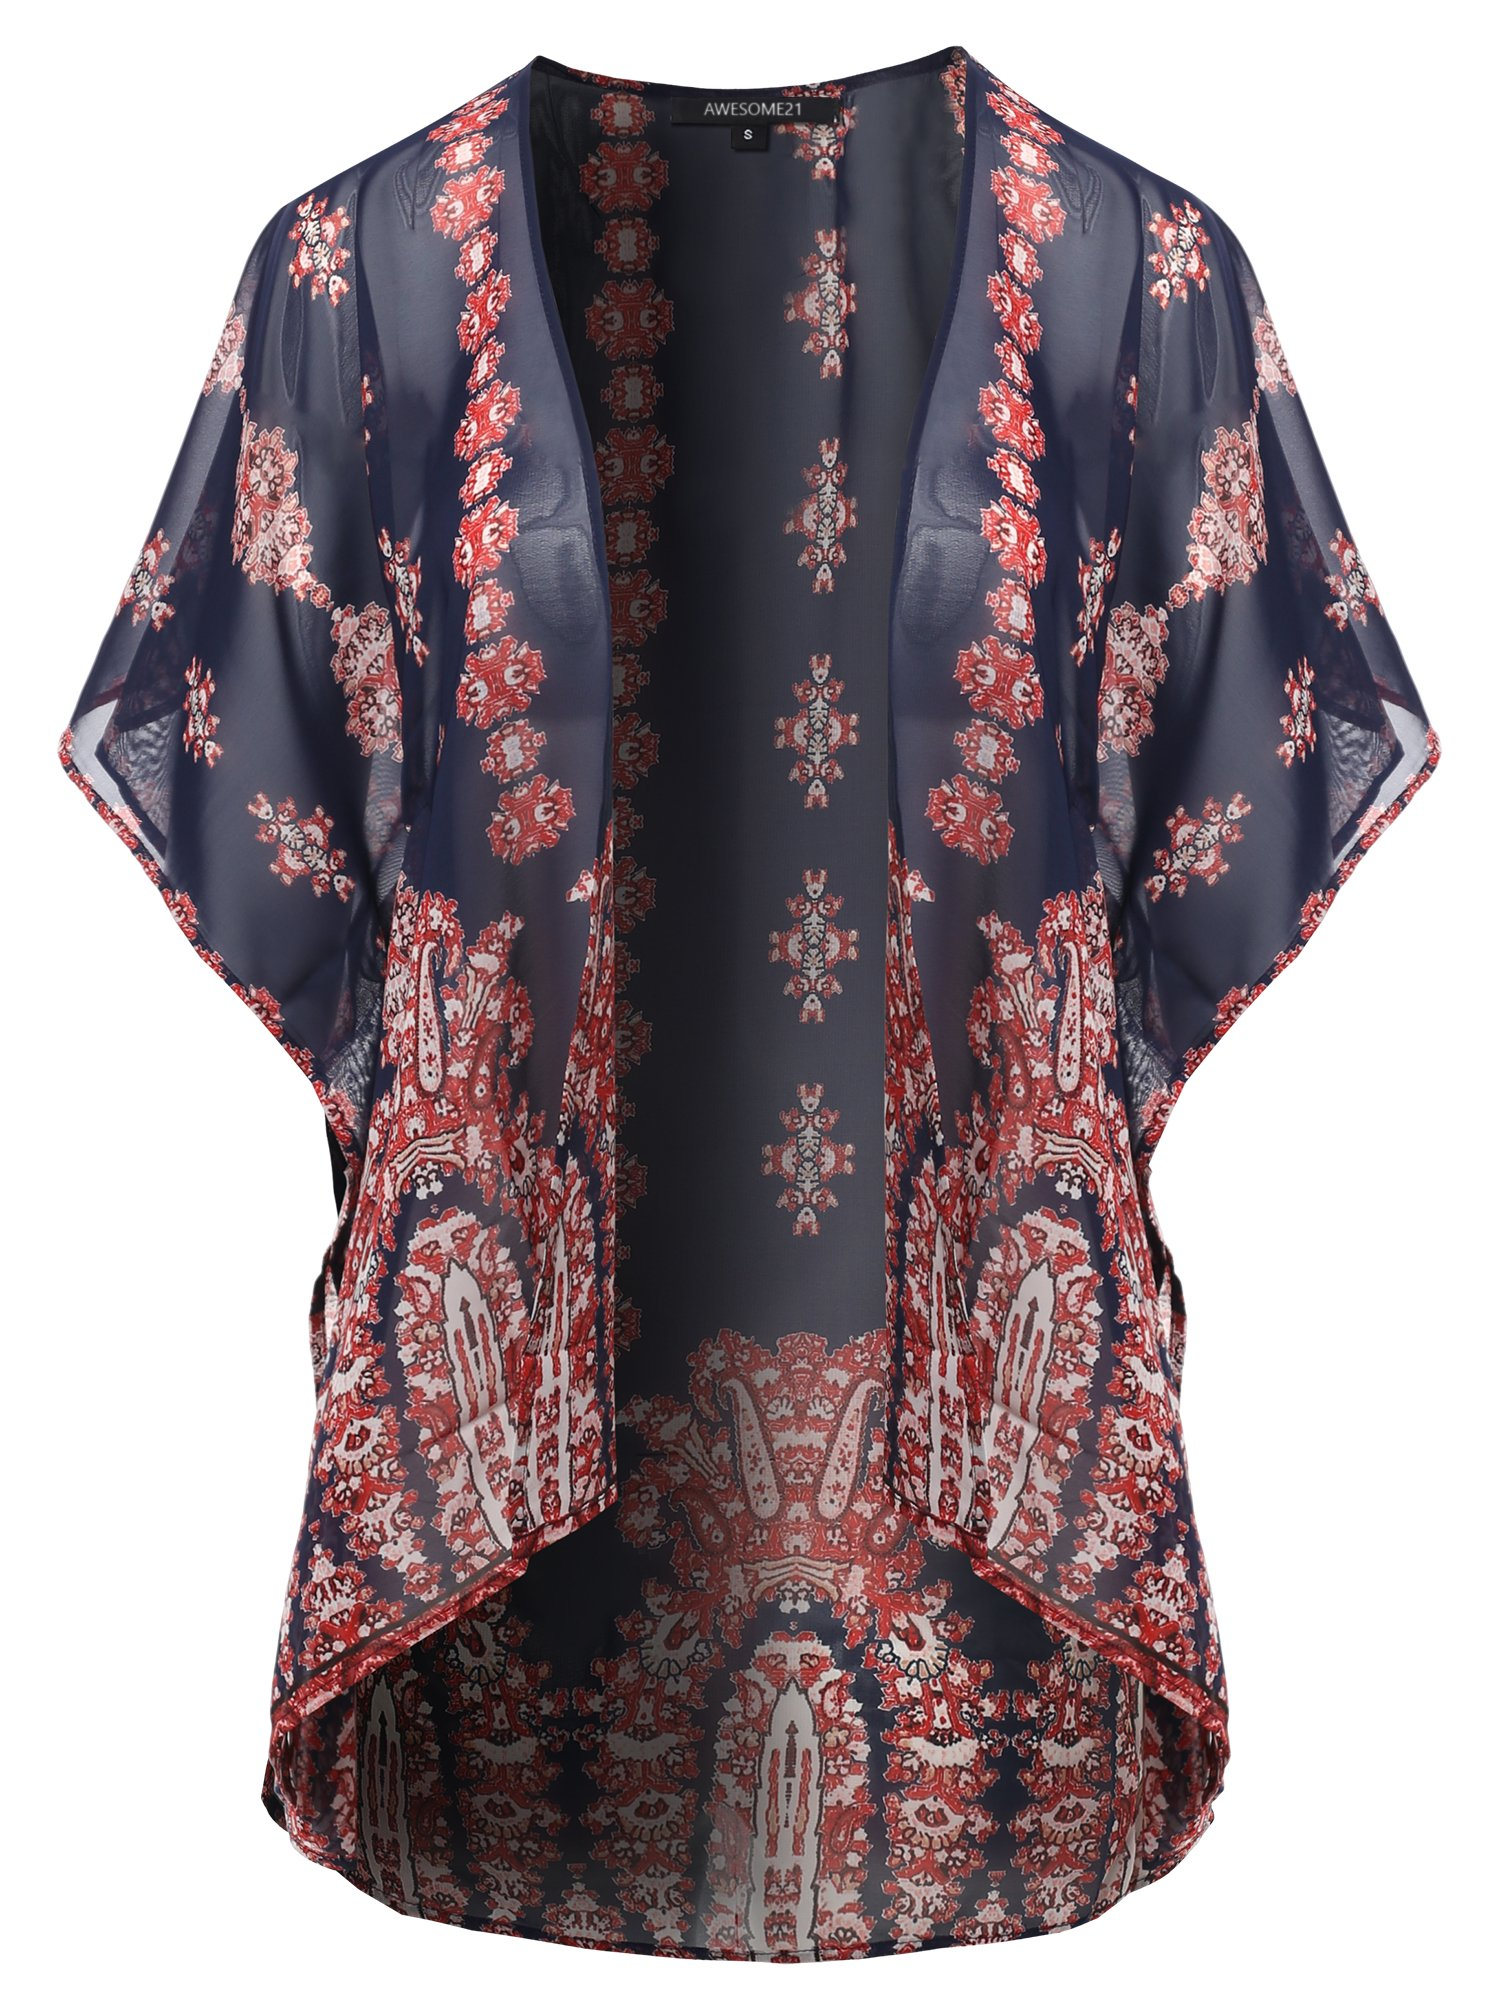 Awesome21 Floral Print Chiffon Kimono Style Cardigan Navy Size 3XL